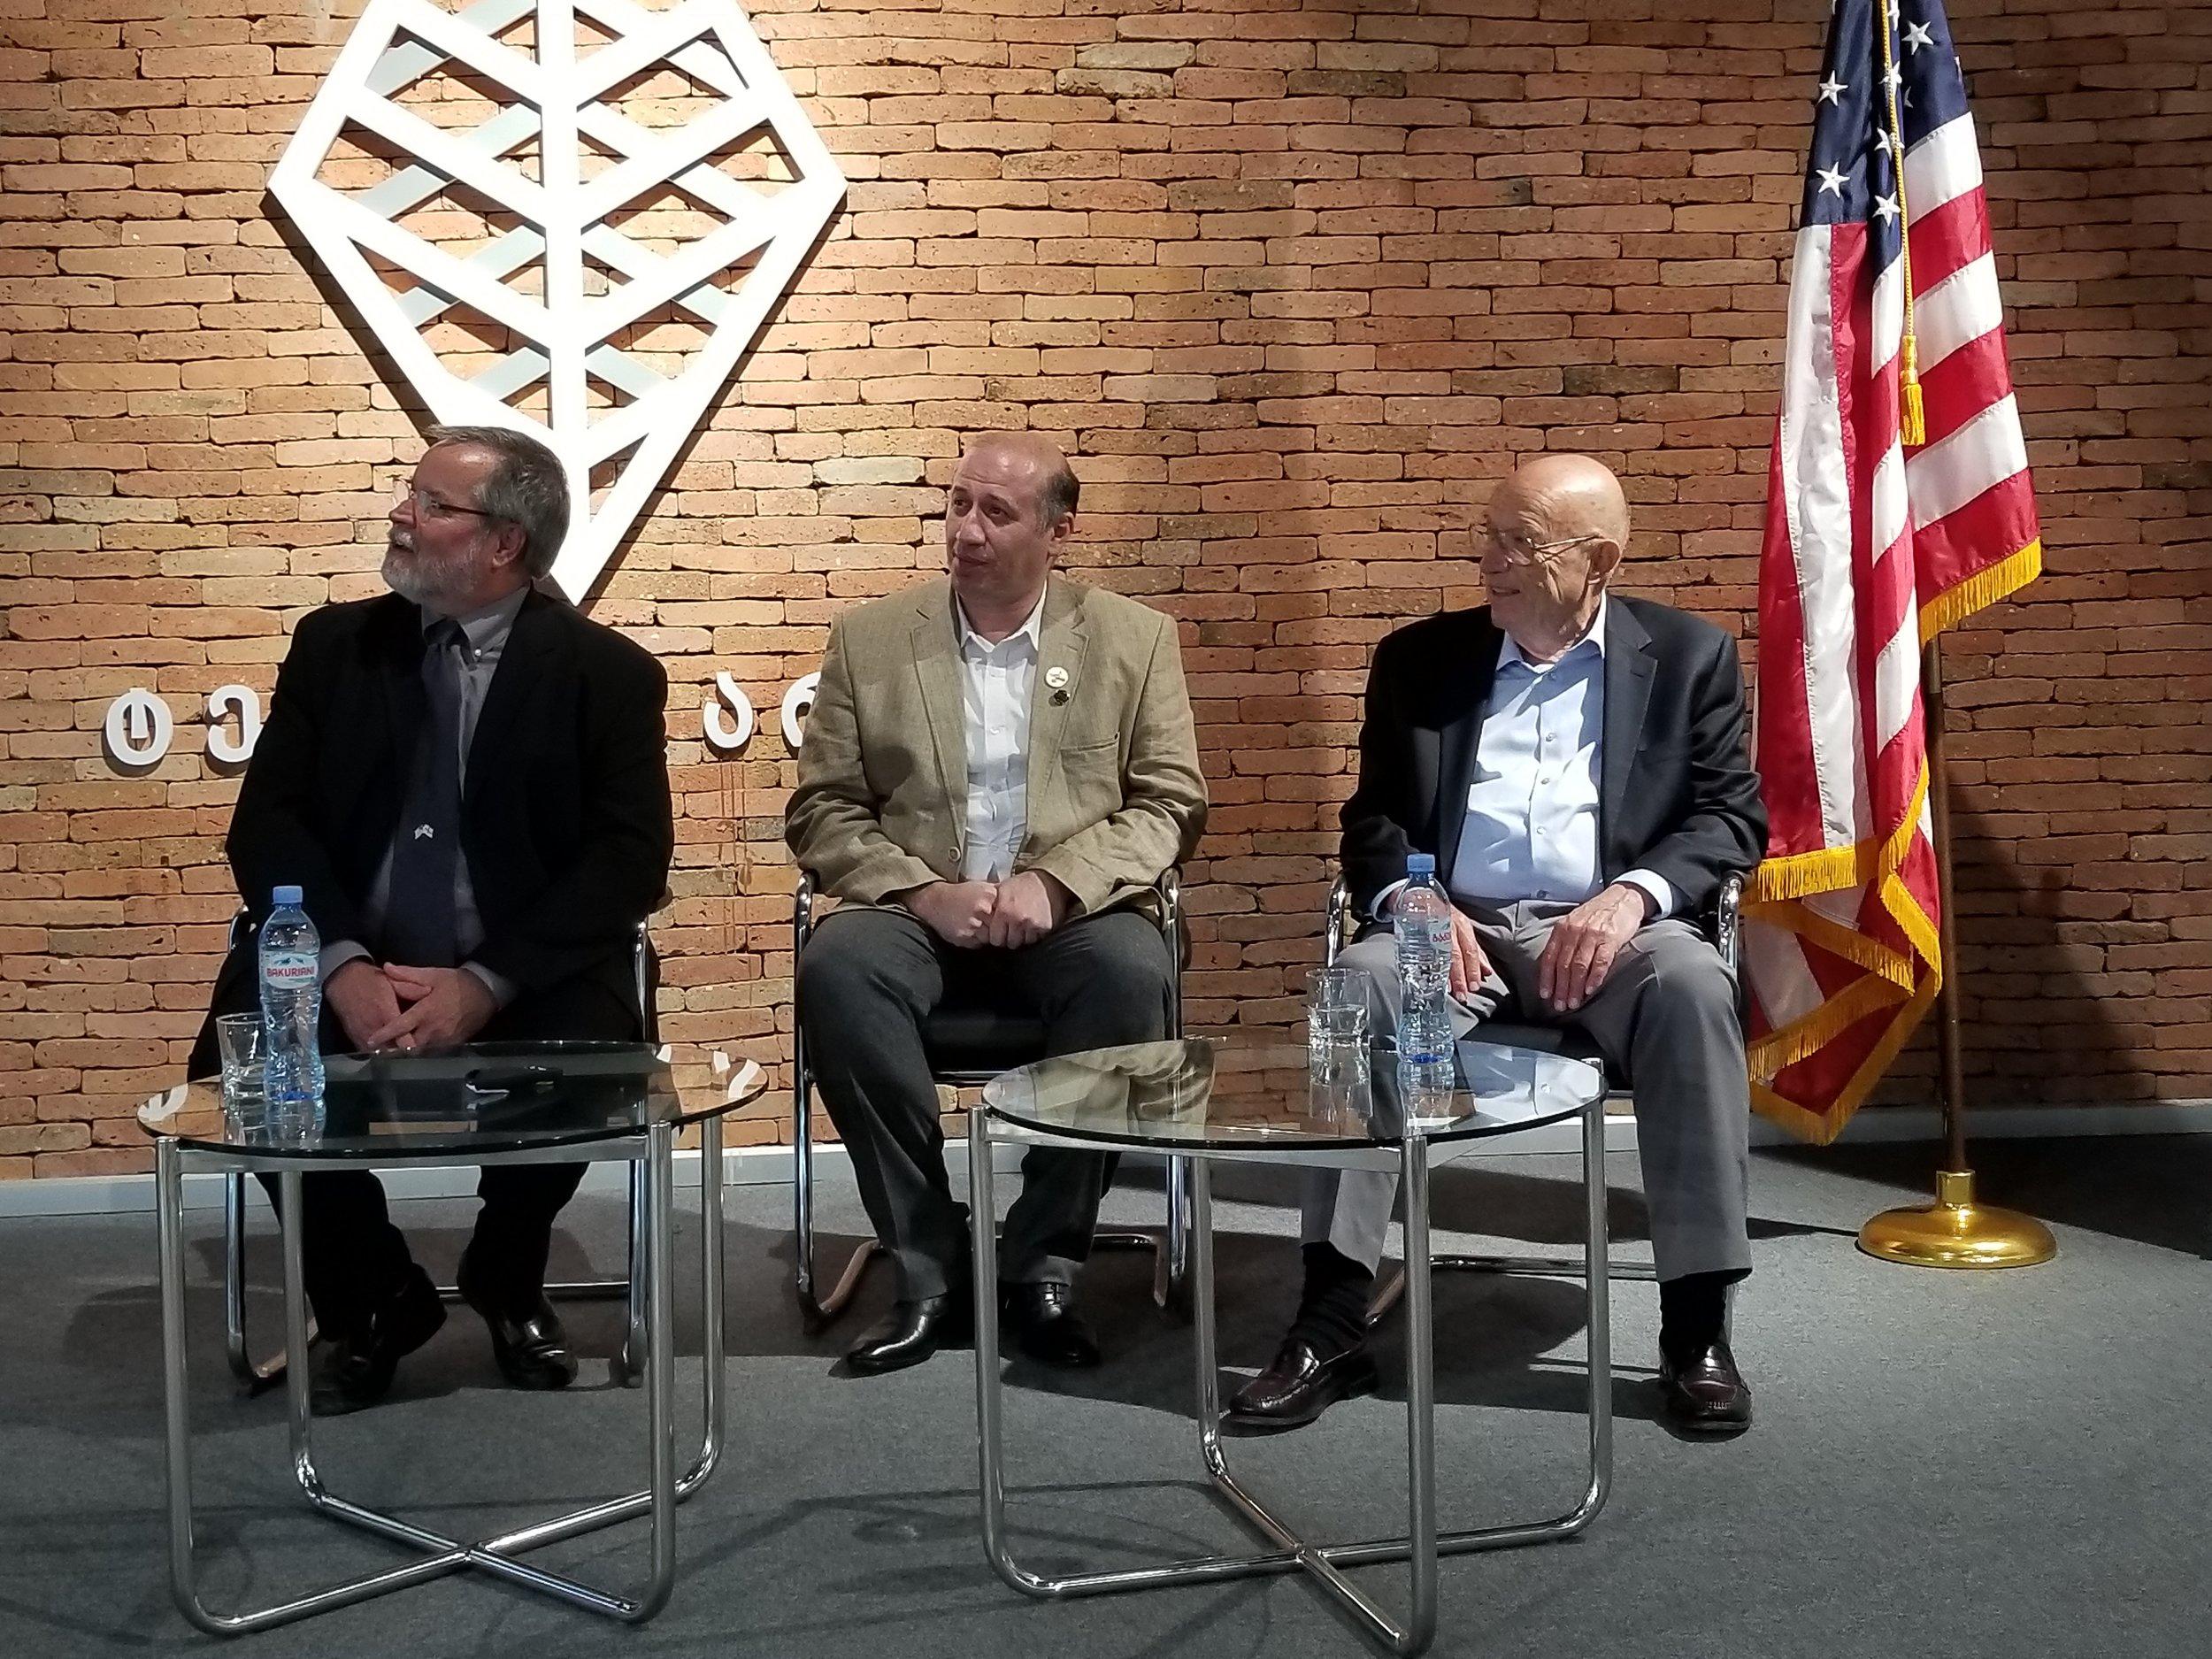 Ramaz Bluashvili interviewing Robert Manning (left) and John Casini (right)